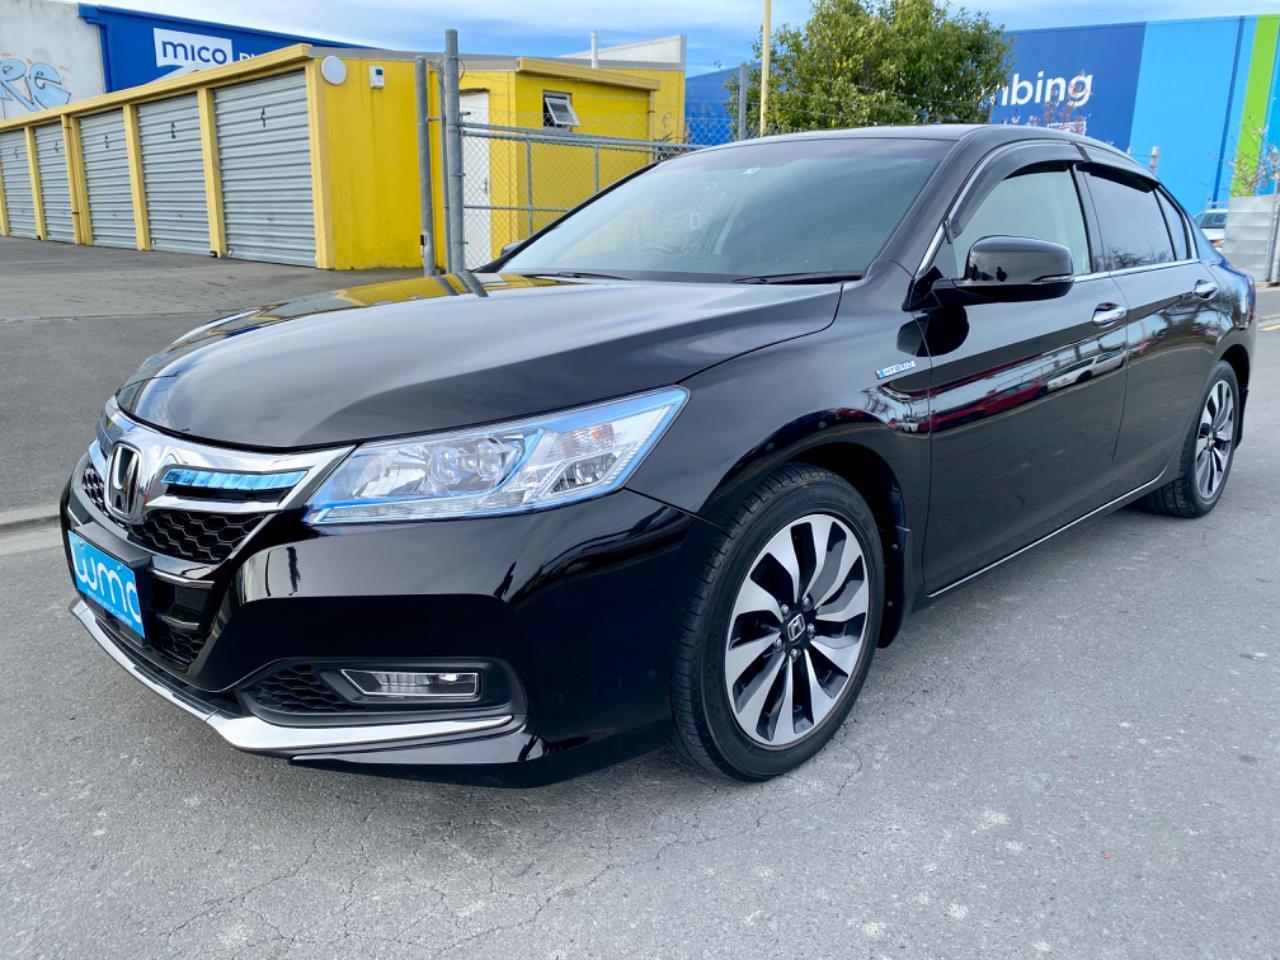 image-5, 2013 Honda Accord Hybrid 'LX' at Christchurch